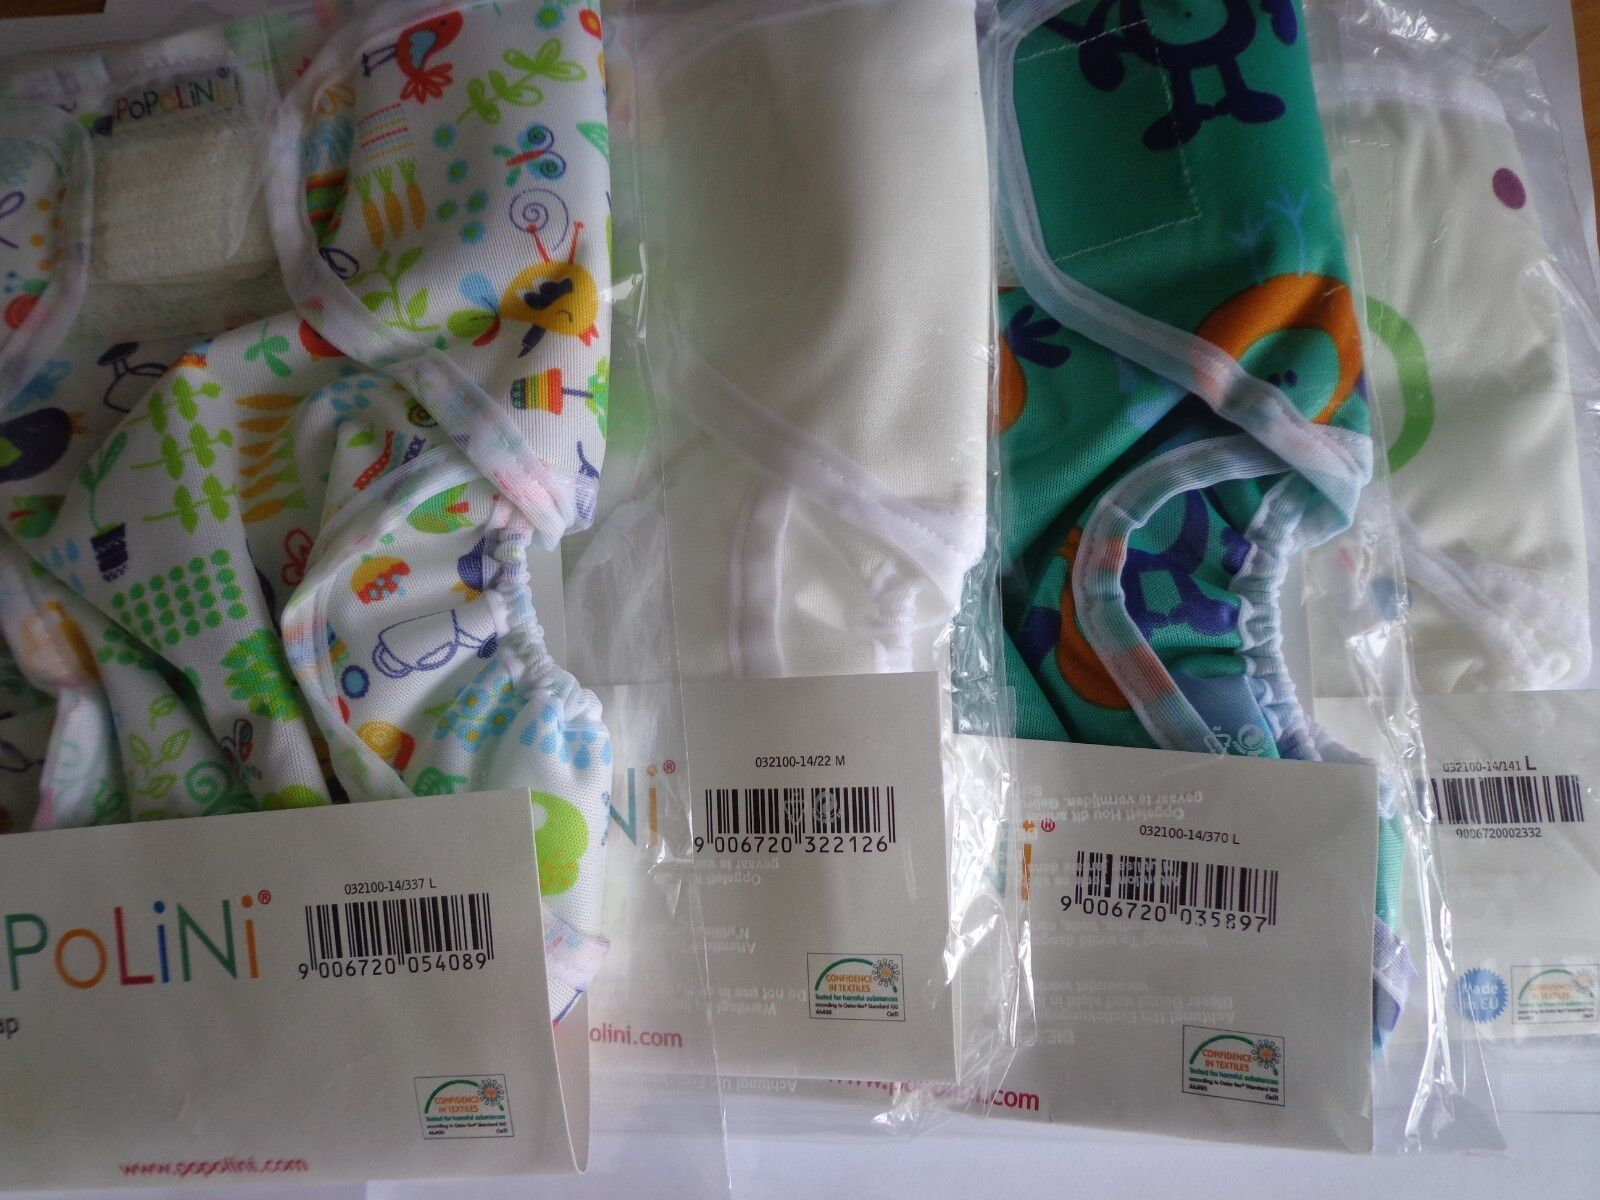 Popowrap Gr.S 3-6 Kg Baby Überhose für Stoffwindeln Windelüberhose Popolini Neu